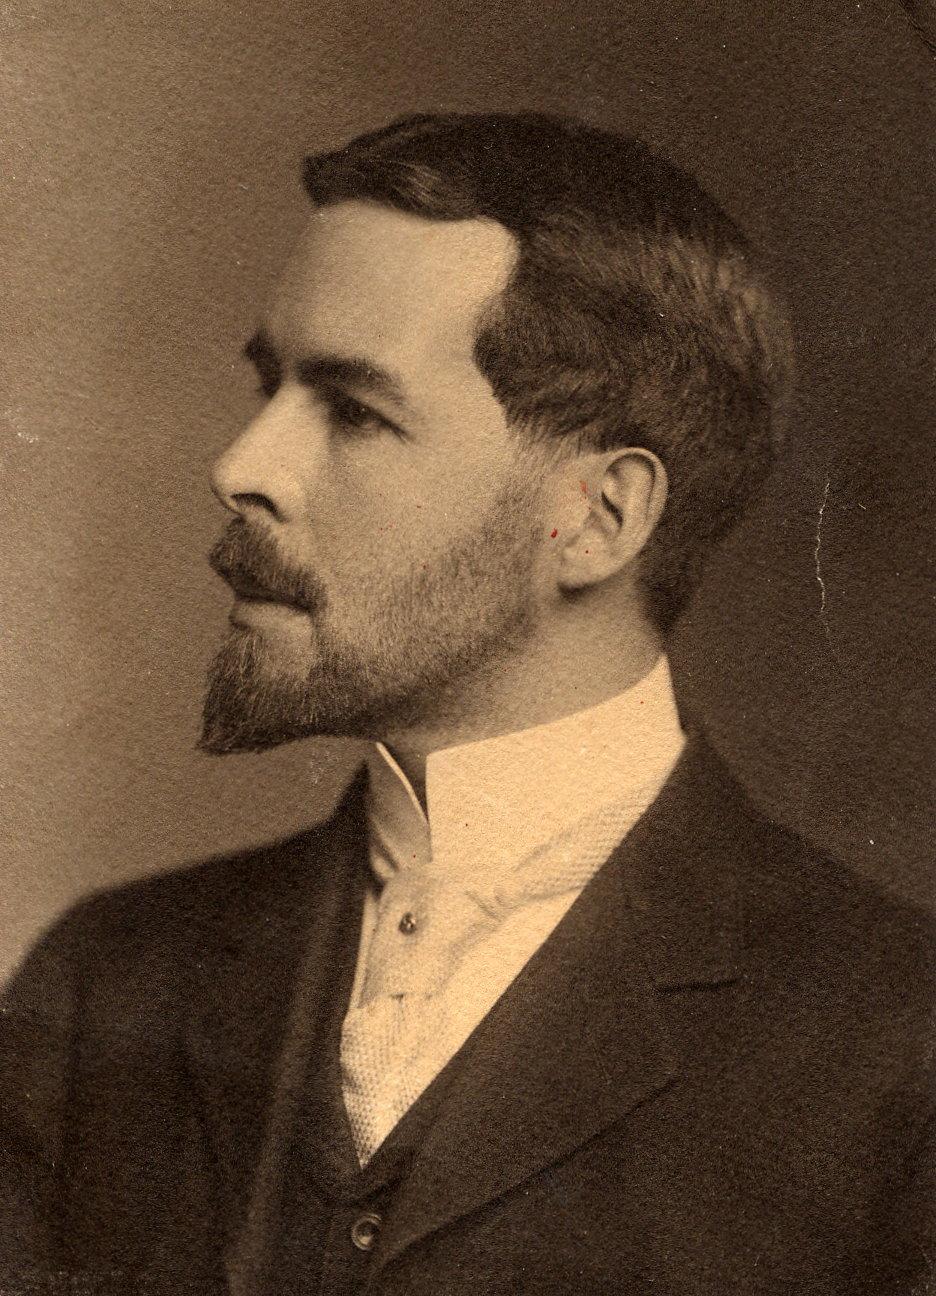 Файл:Gilbert Newton Lewis.jpg — Википедия